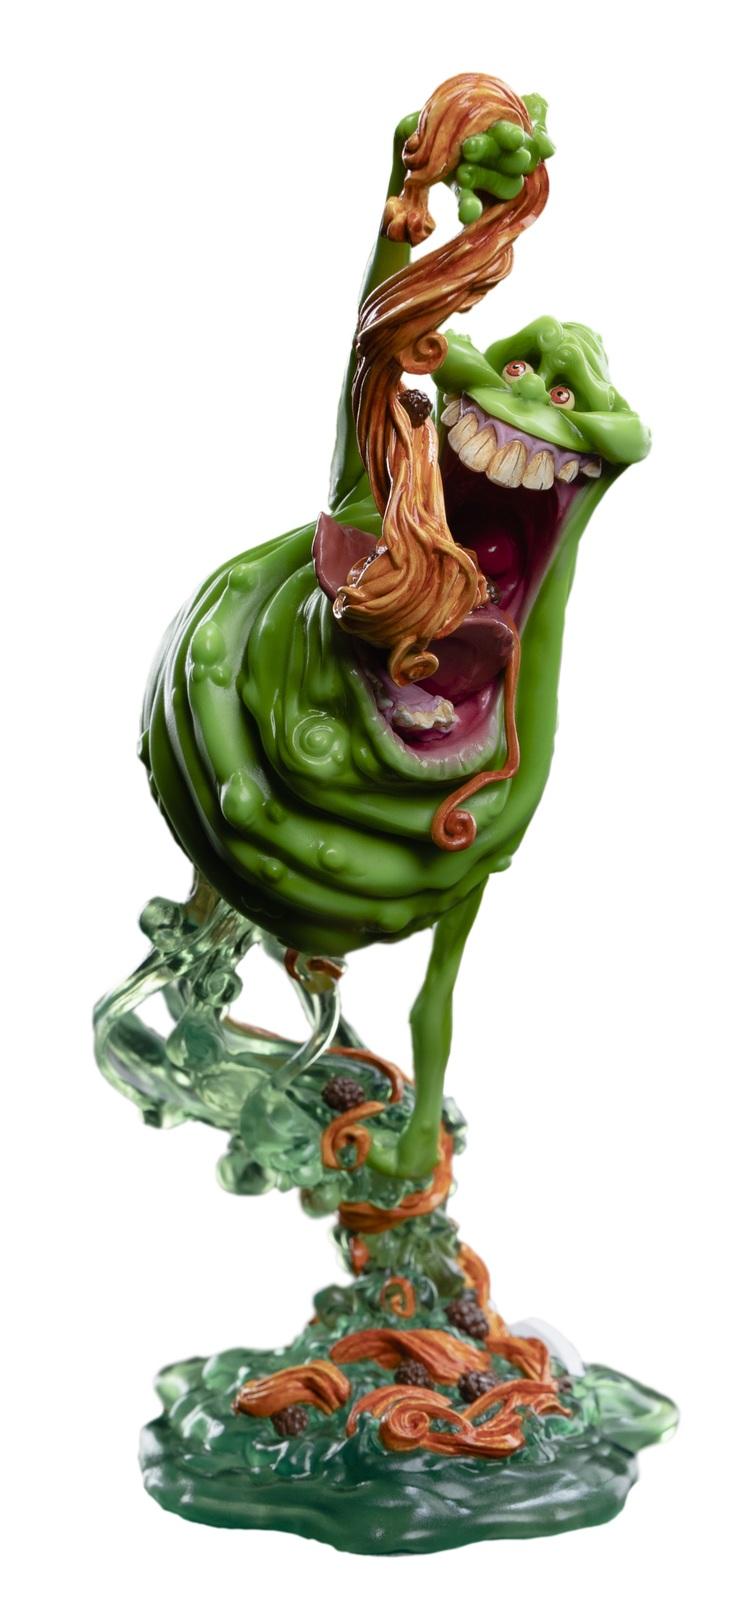 Ghostbusters: Mini Epics - Slimer image